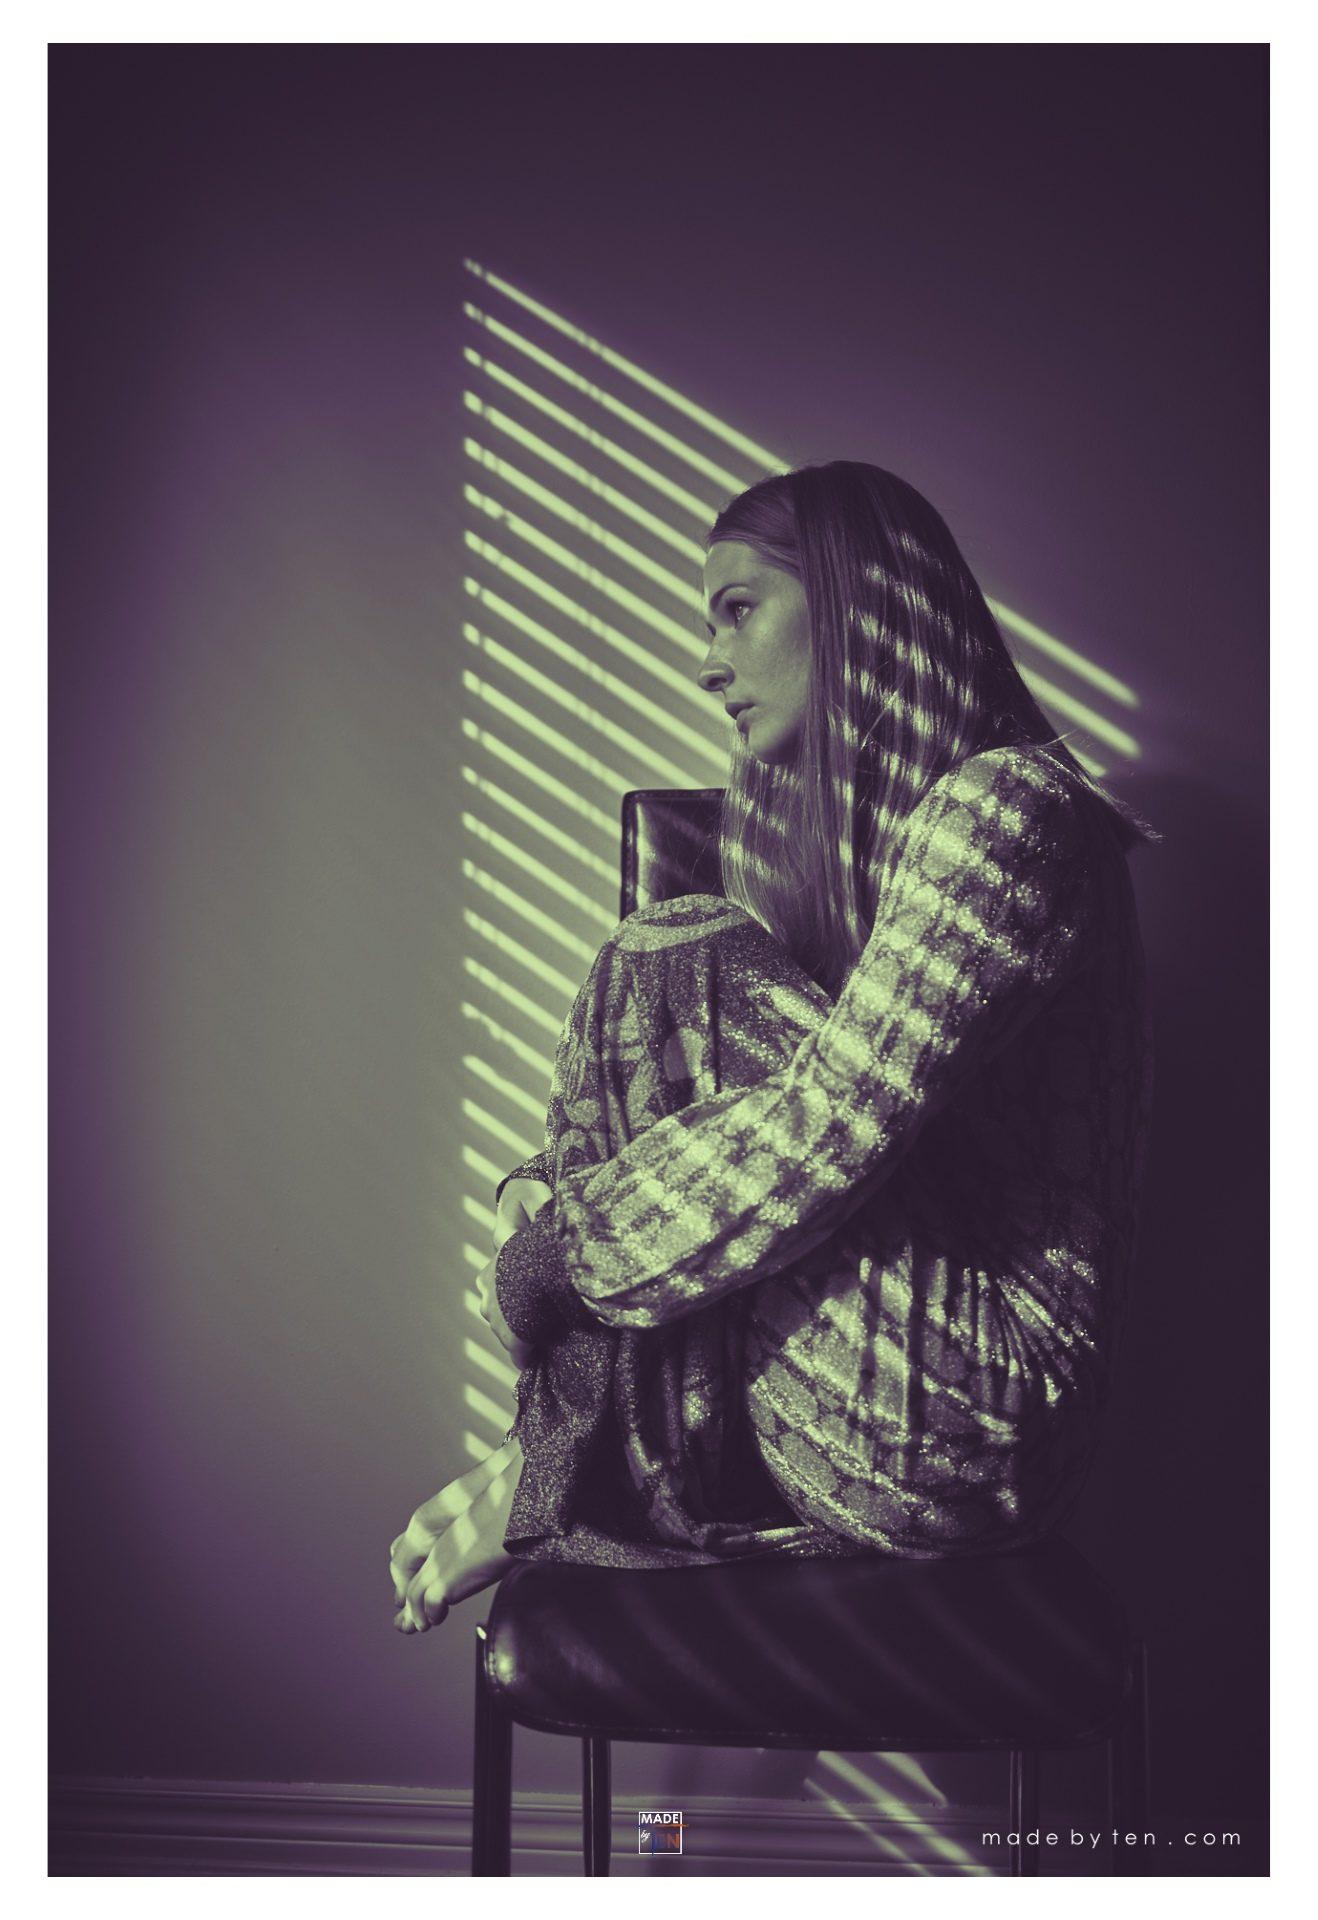 Sitting by Window - GTA Women Art Photography